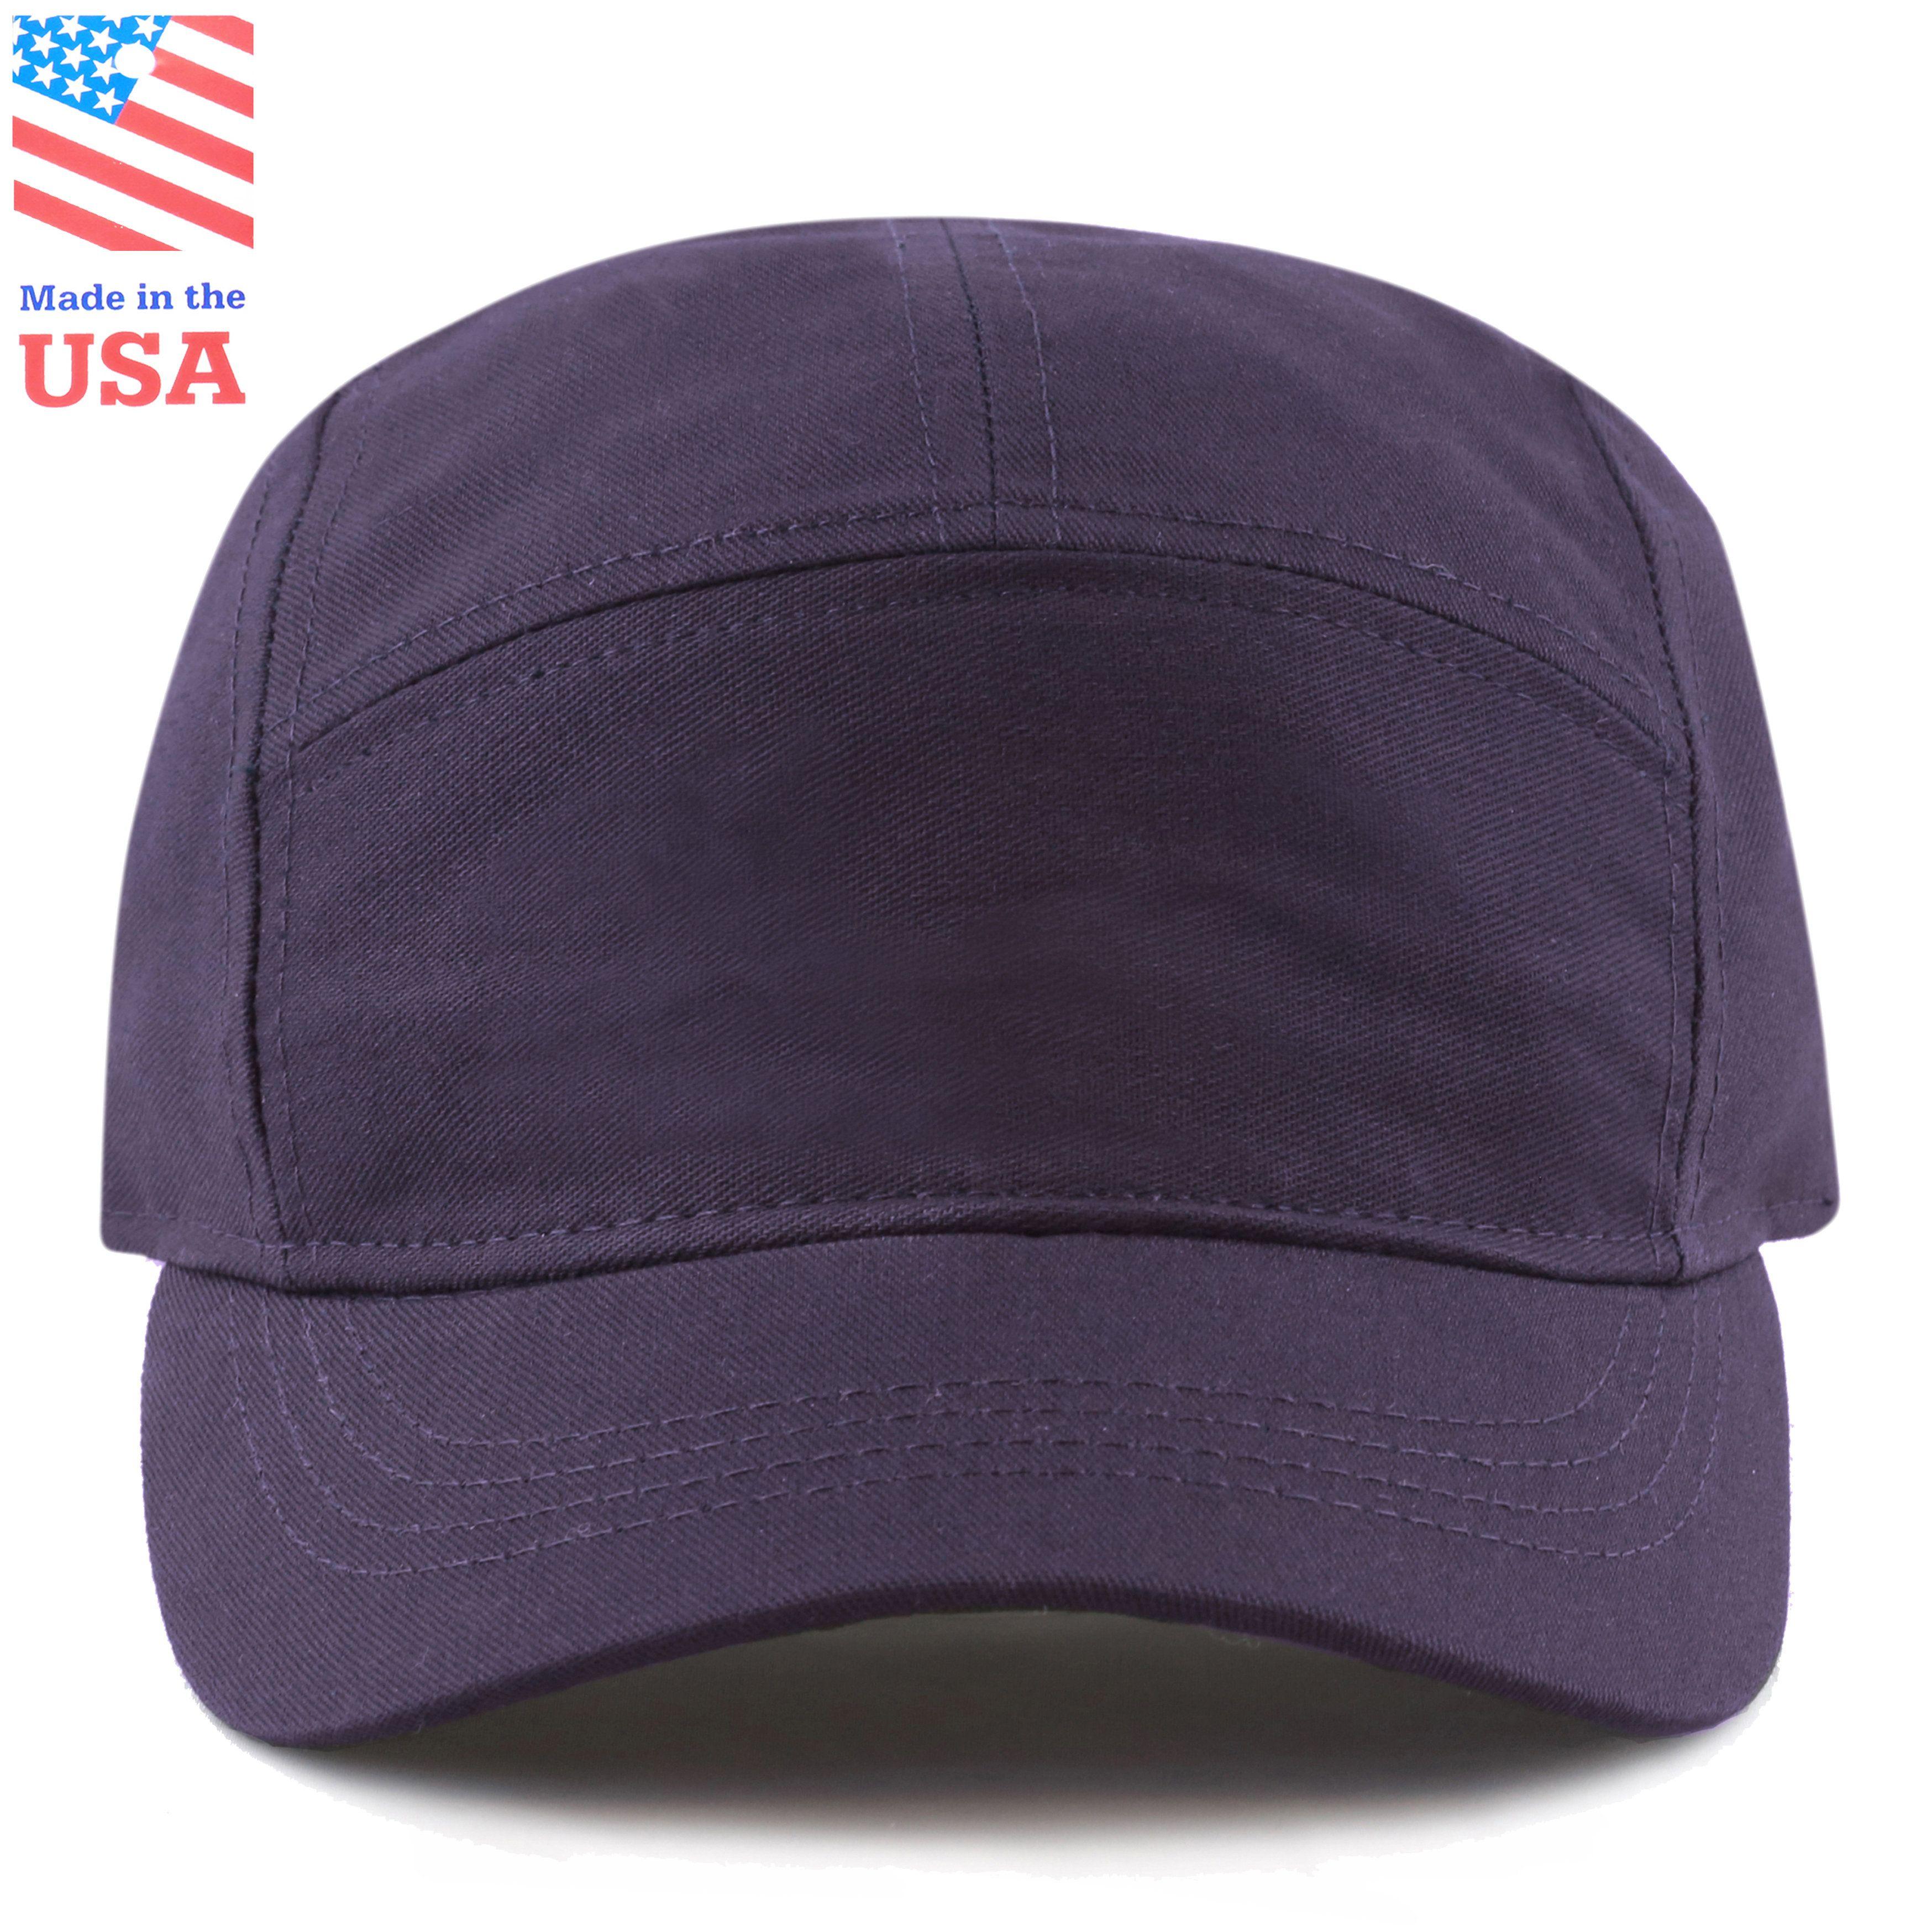 904d3fd4288f5 FLOTUS Melania Trump Adult One size Multi Hat Cap